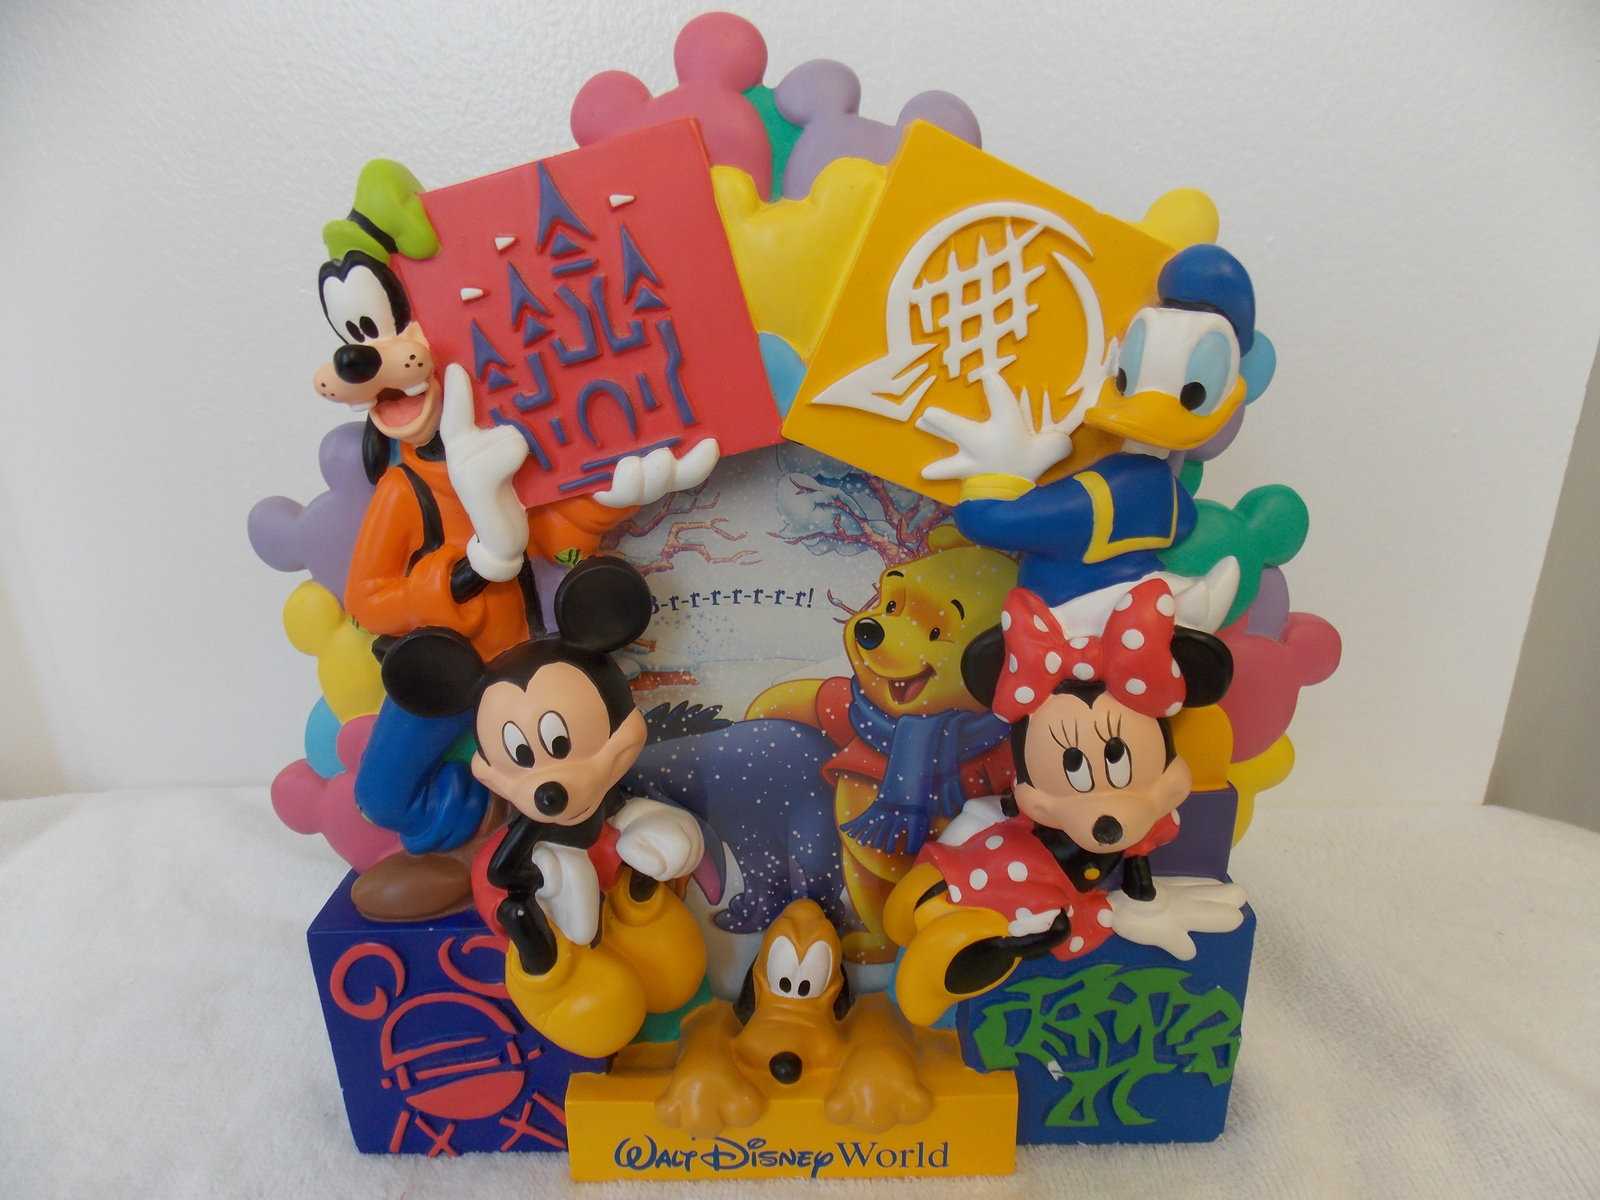 Walt Disney World Fab 5 Parks Photo Frame and 26 similar items